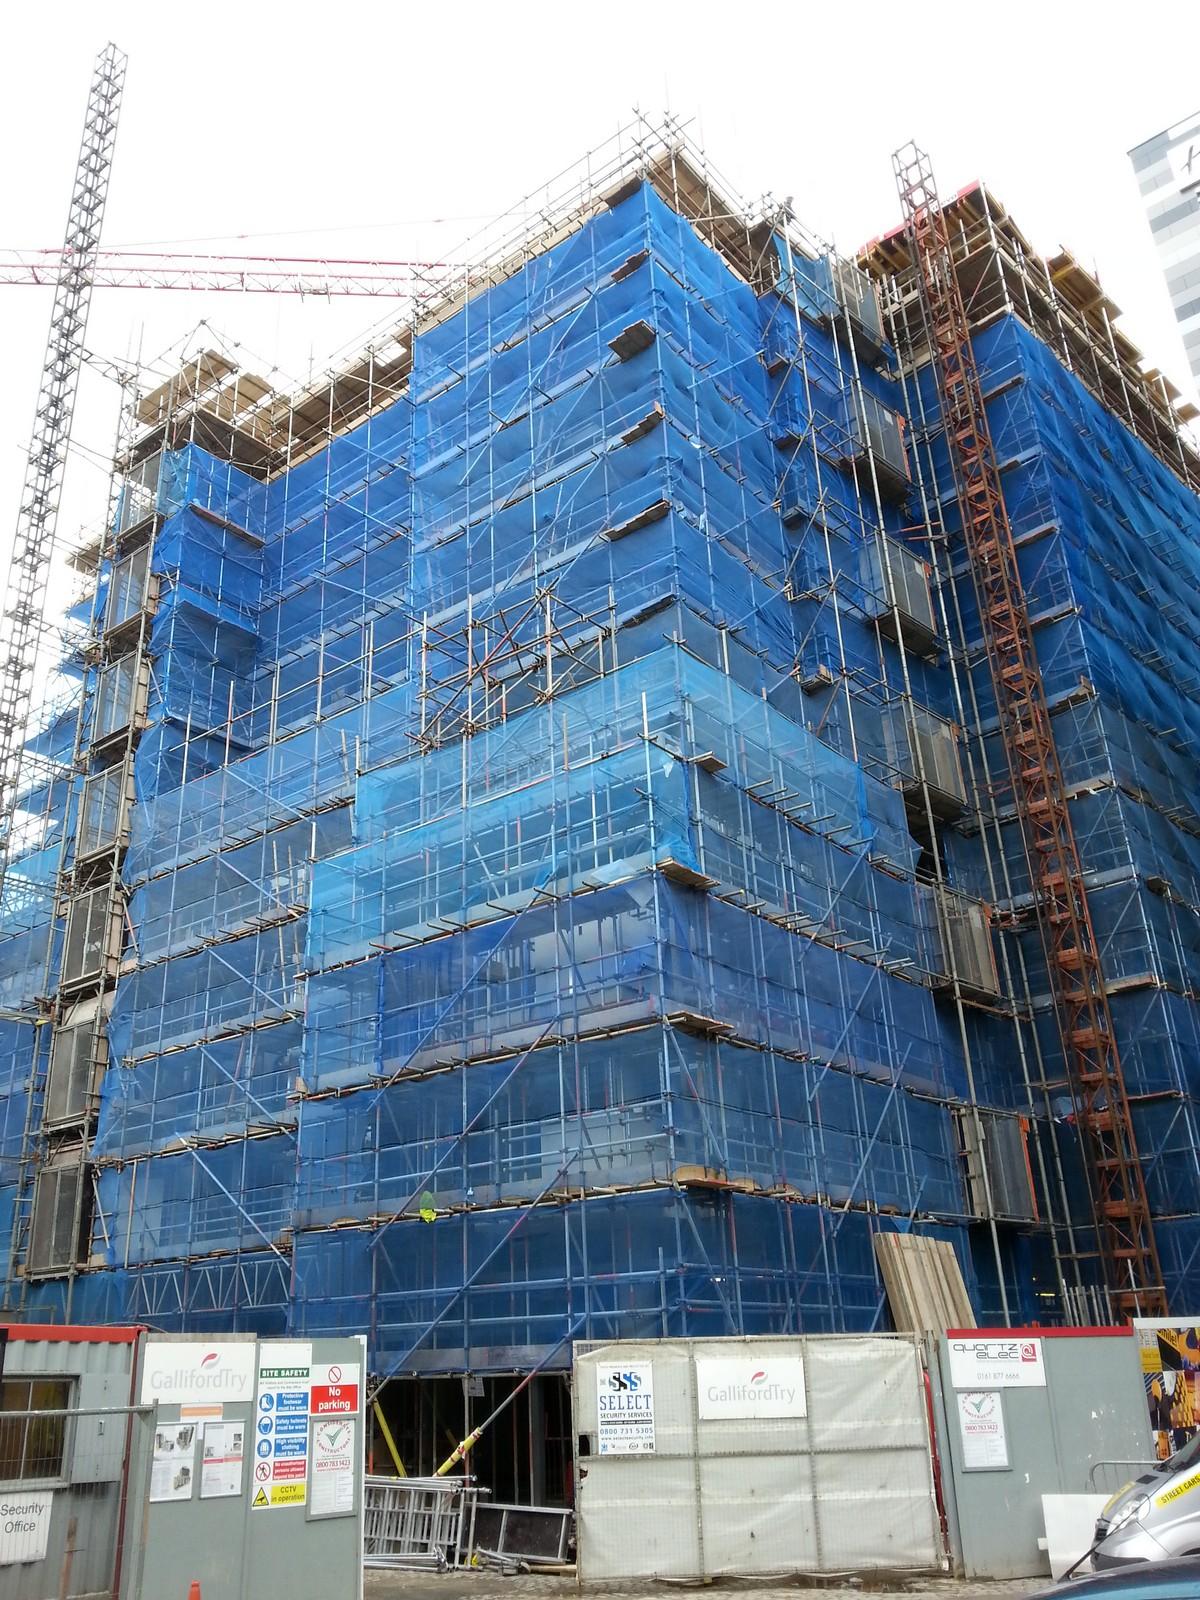 Scaffolding Projects Manchester Sheffield Barnsley